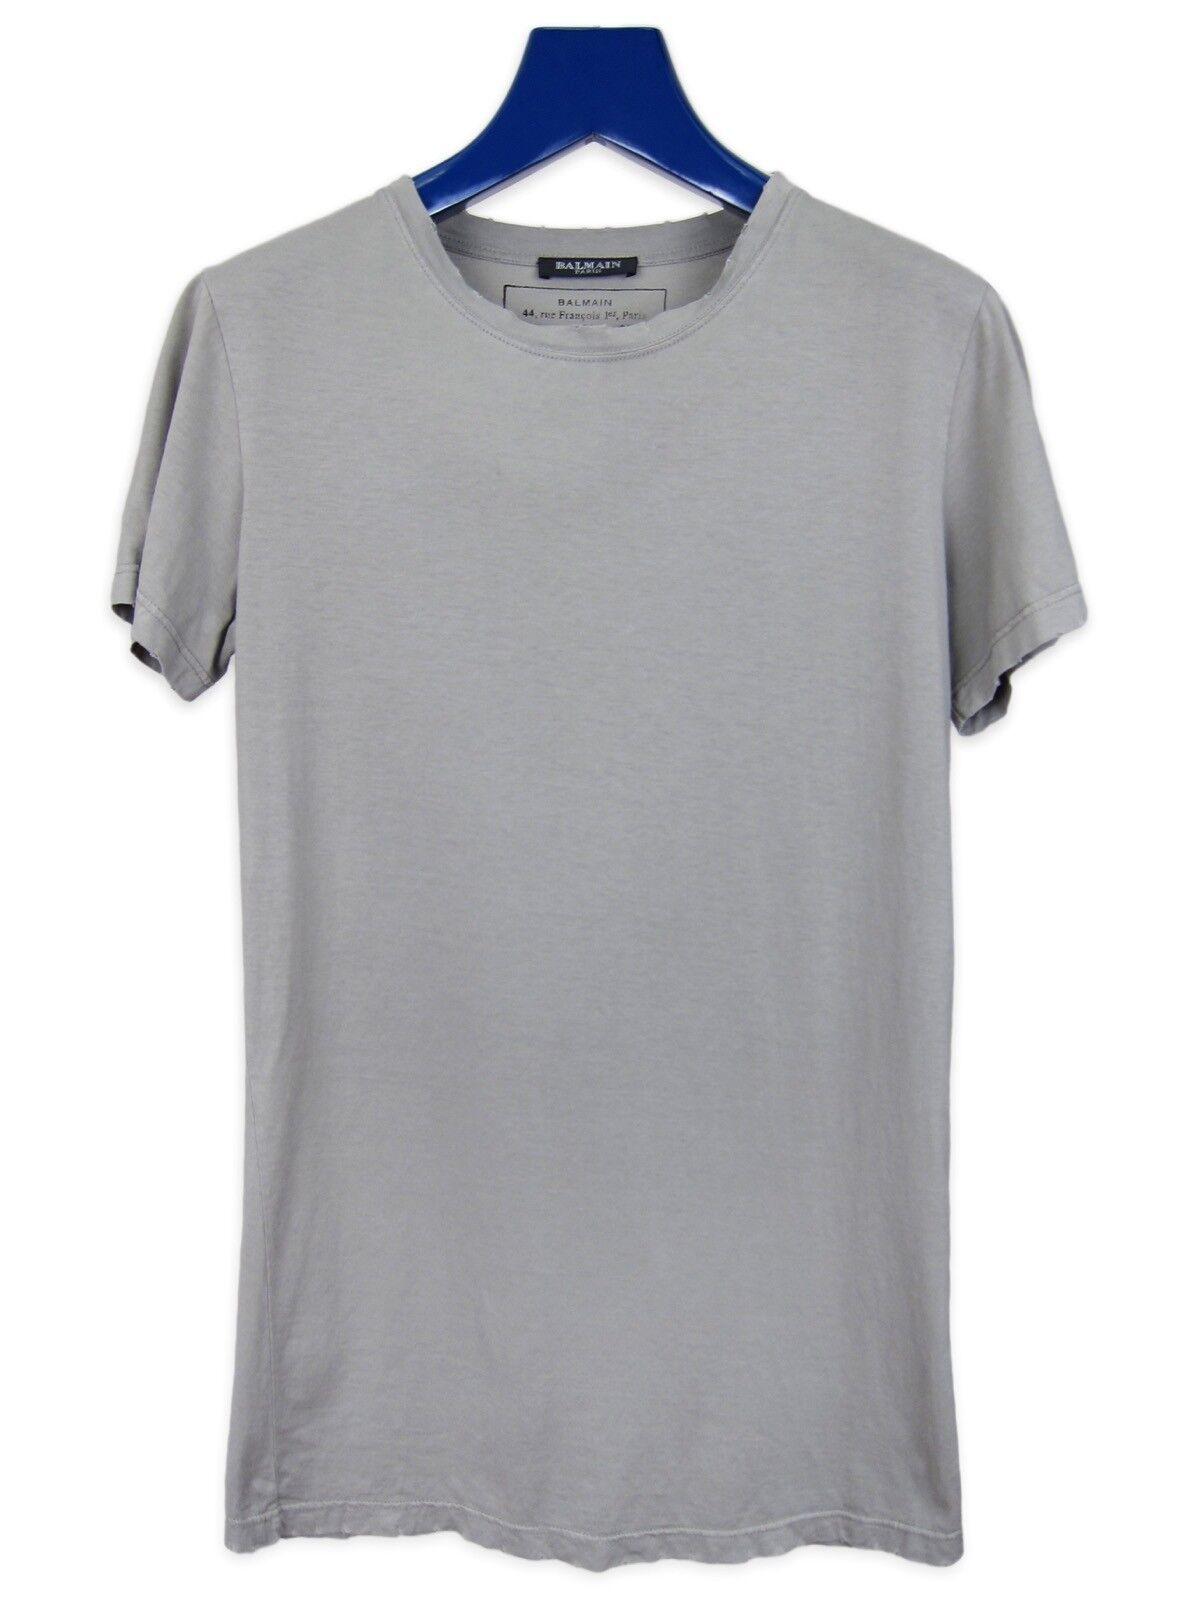 Balmain Faded grau Distressed Military T-Shirt AW11 sz. XS